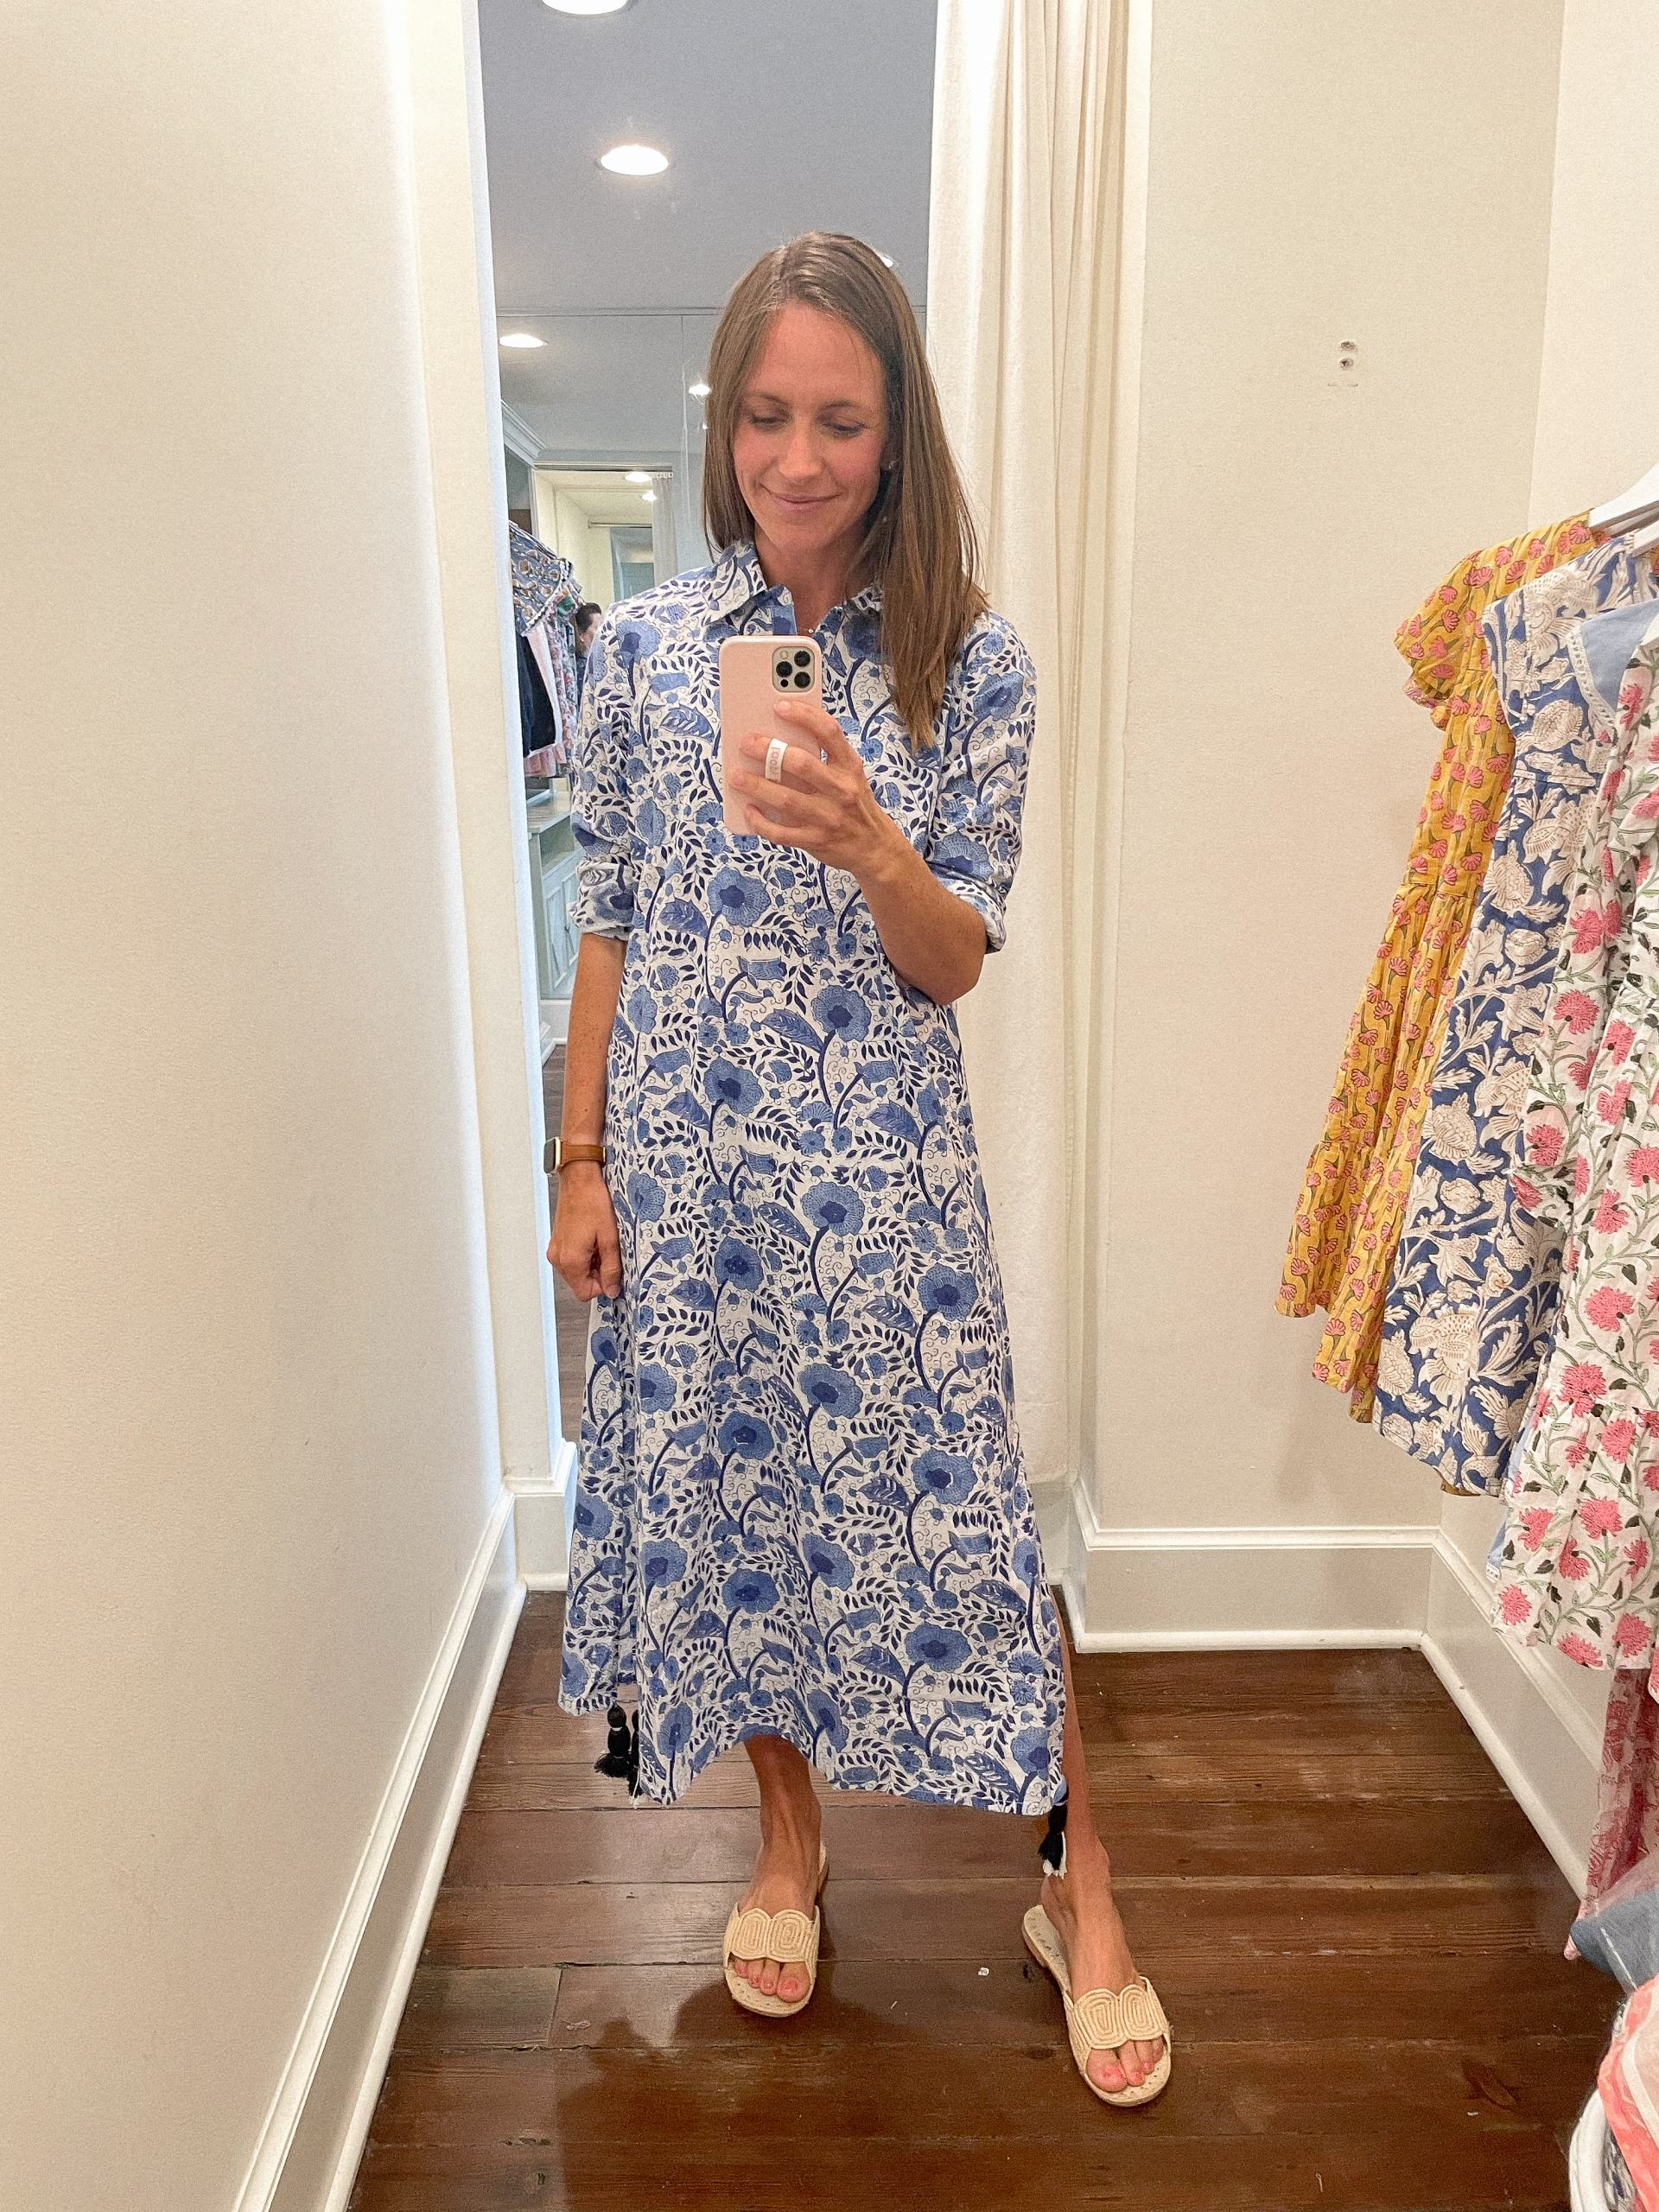 Darren dress - Madison Mathews - Madison Mathews discount code - madison mathews sizing - block print dress